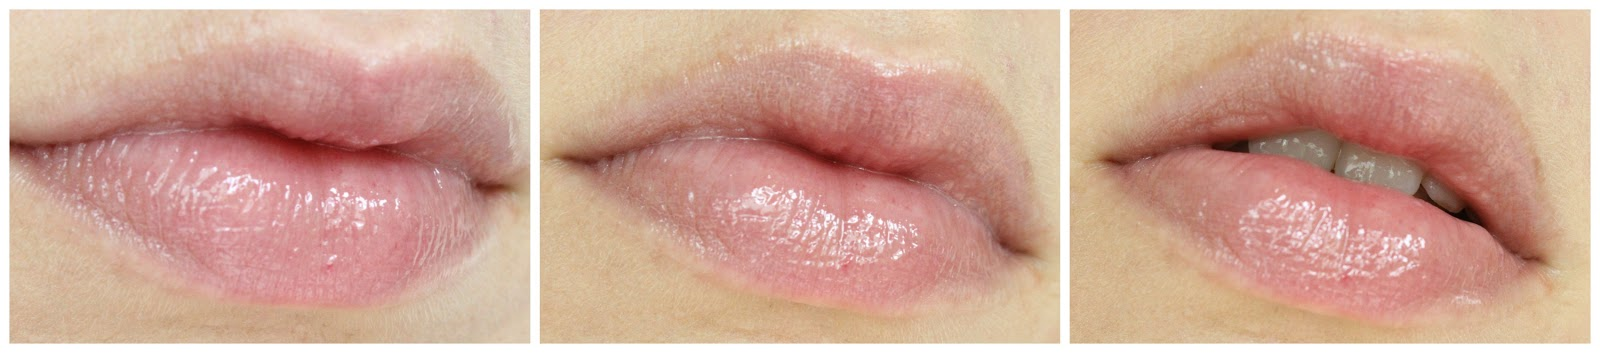 Lippen mit Clinique Superbalm Moisturizing Gloss Grapefruit